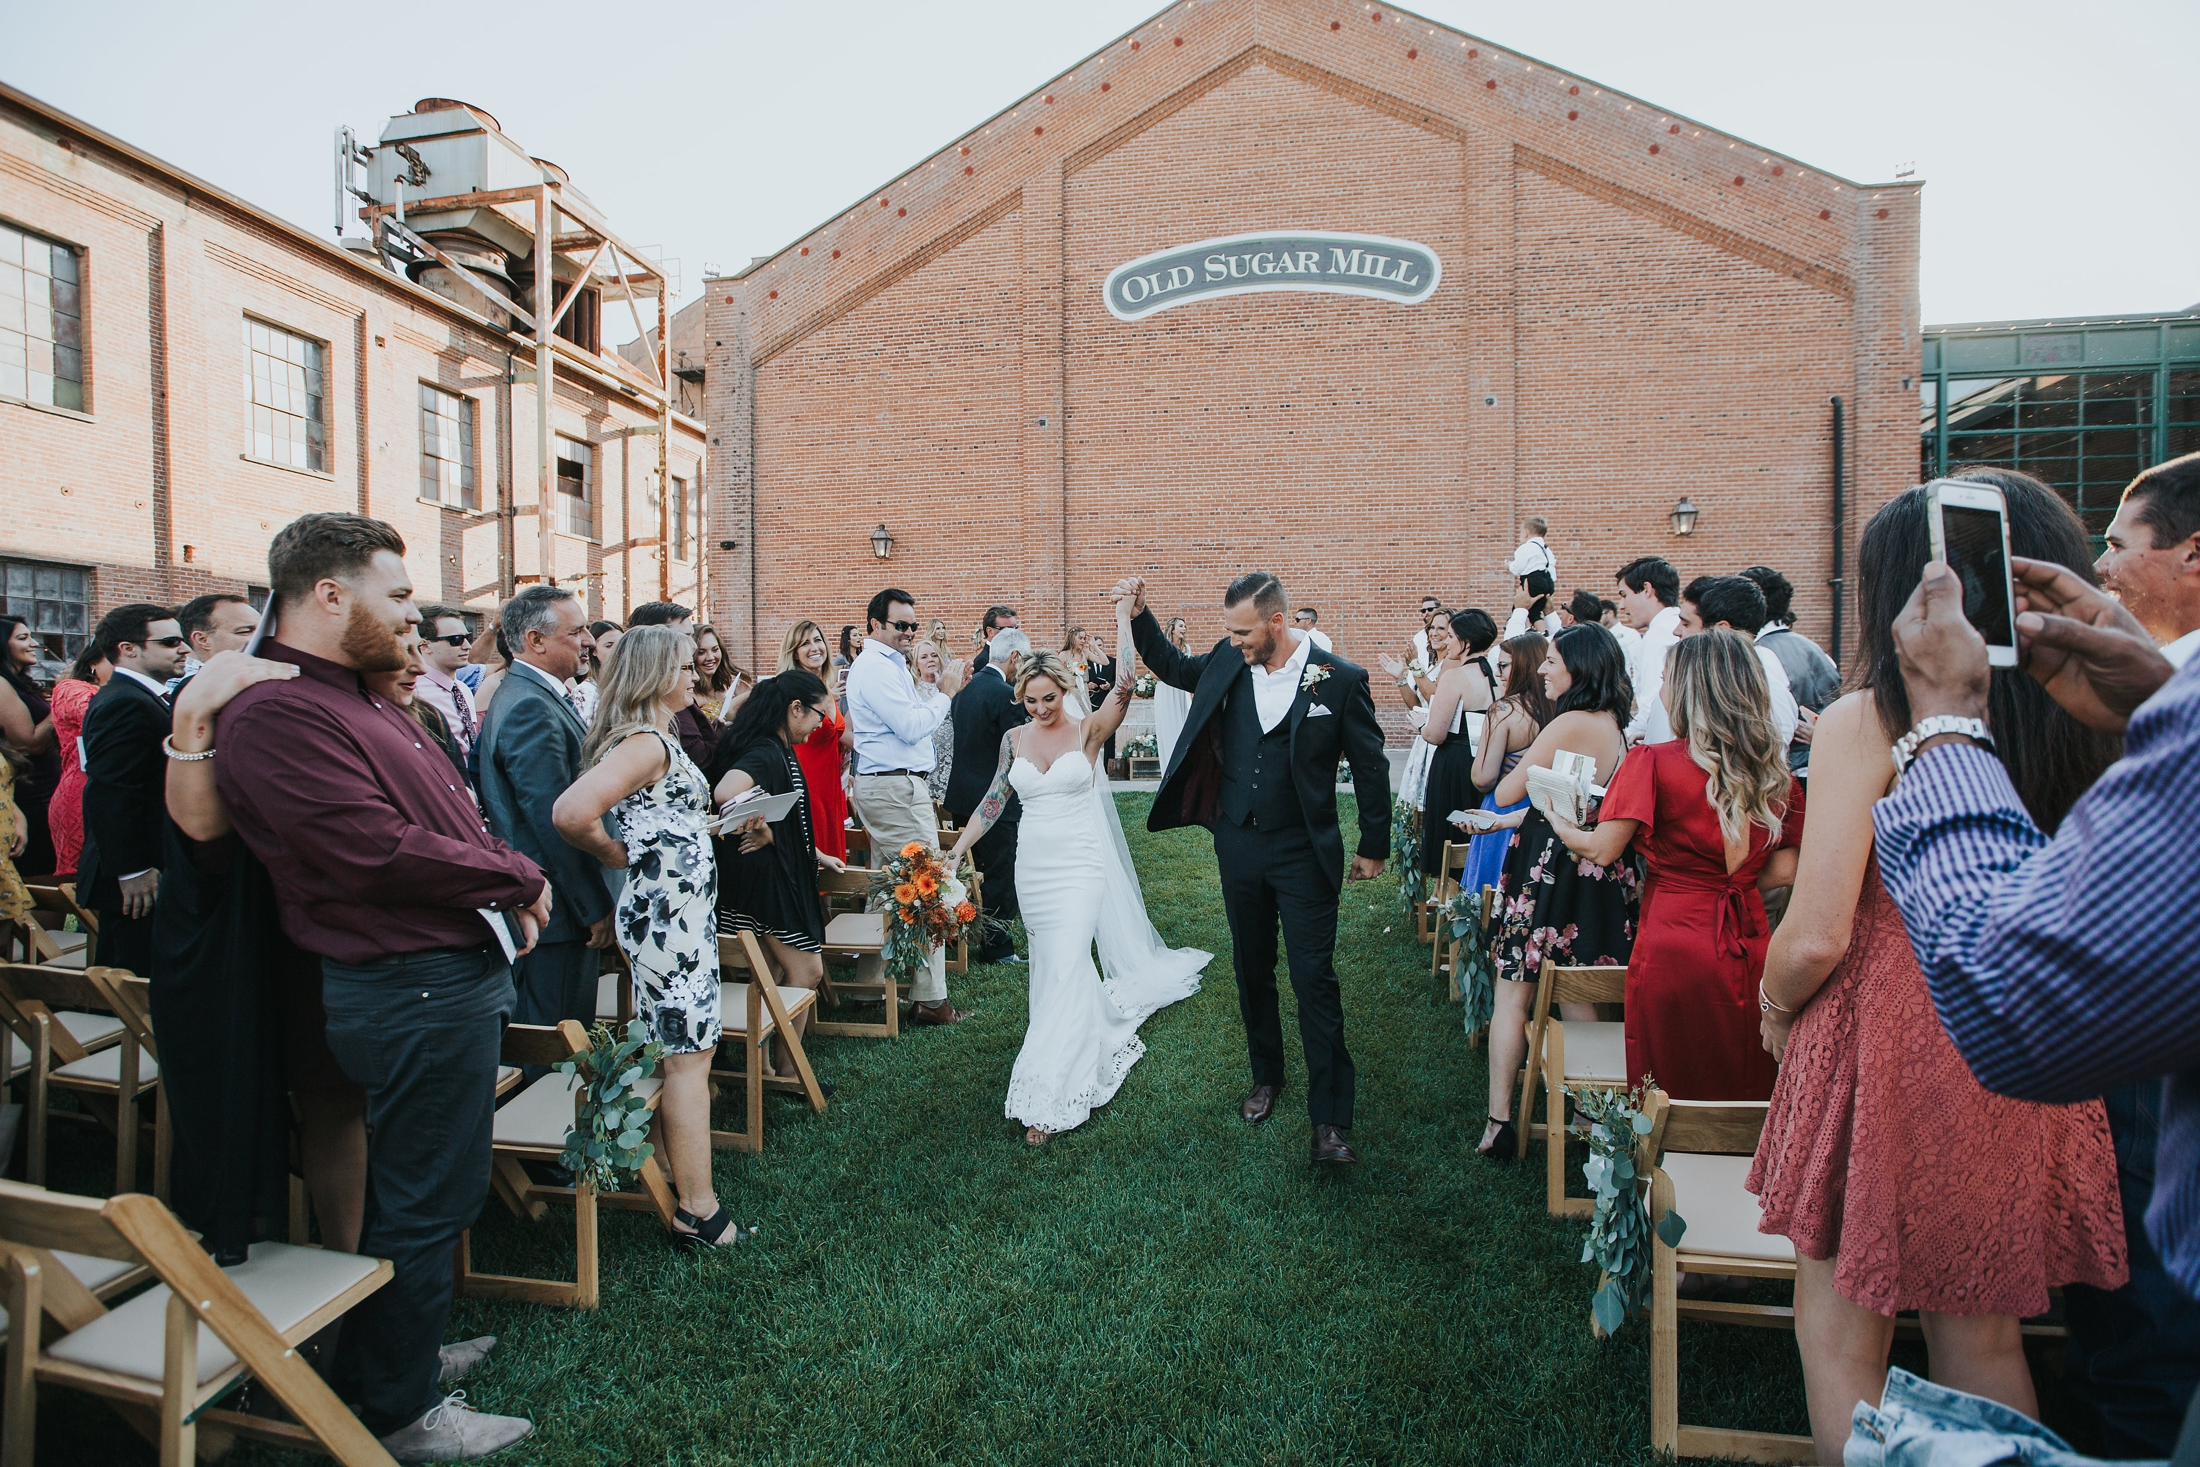 old-sugar-mill-wedding-photographer-sacramento-41.jpg